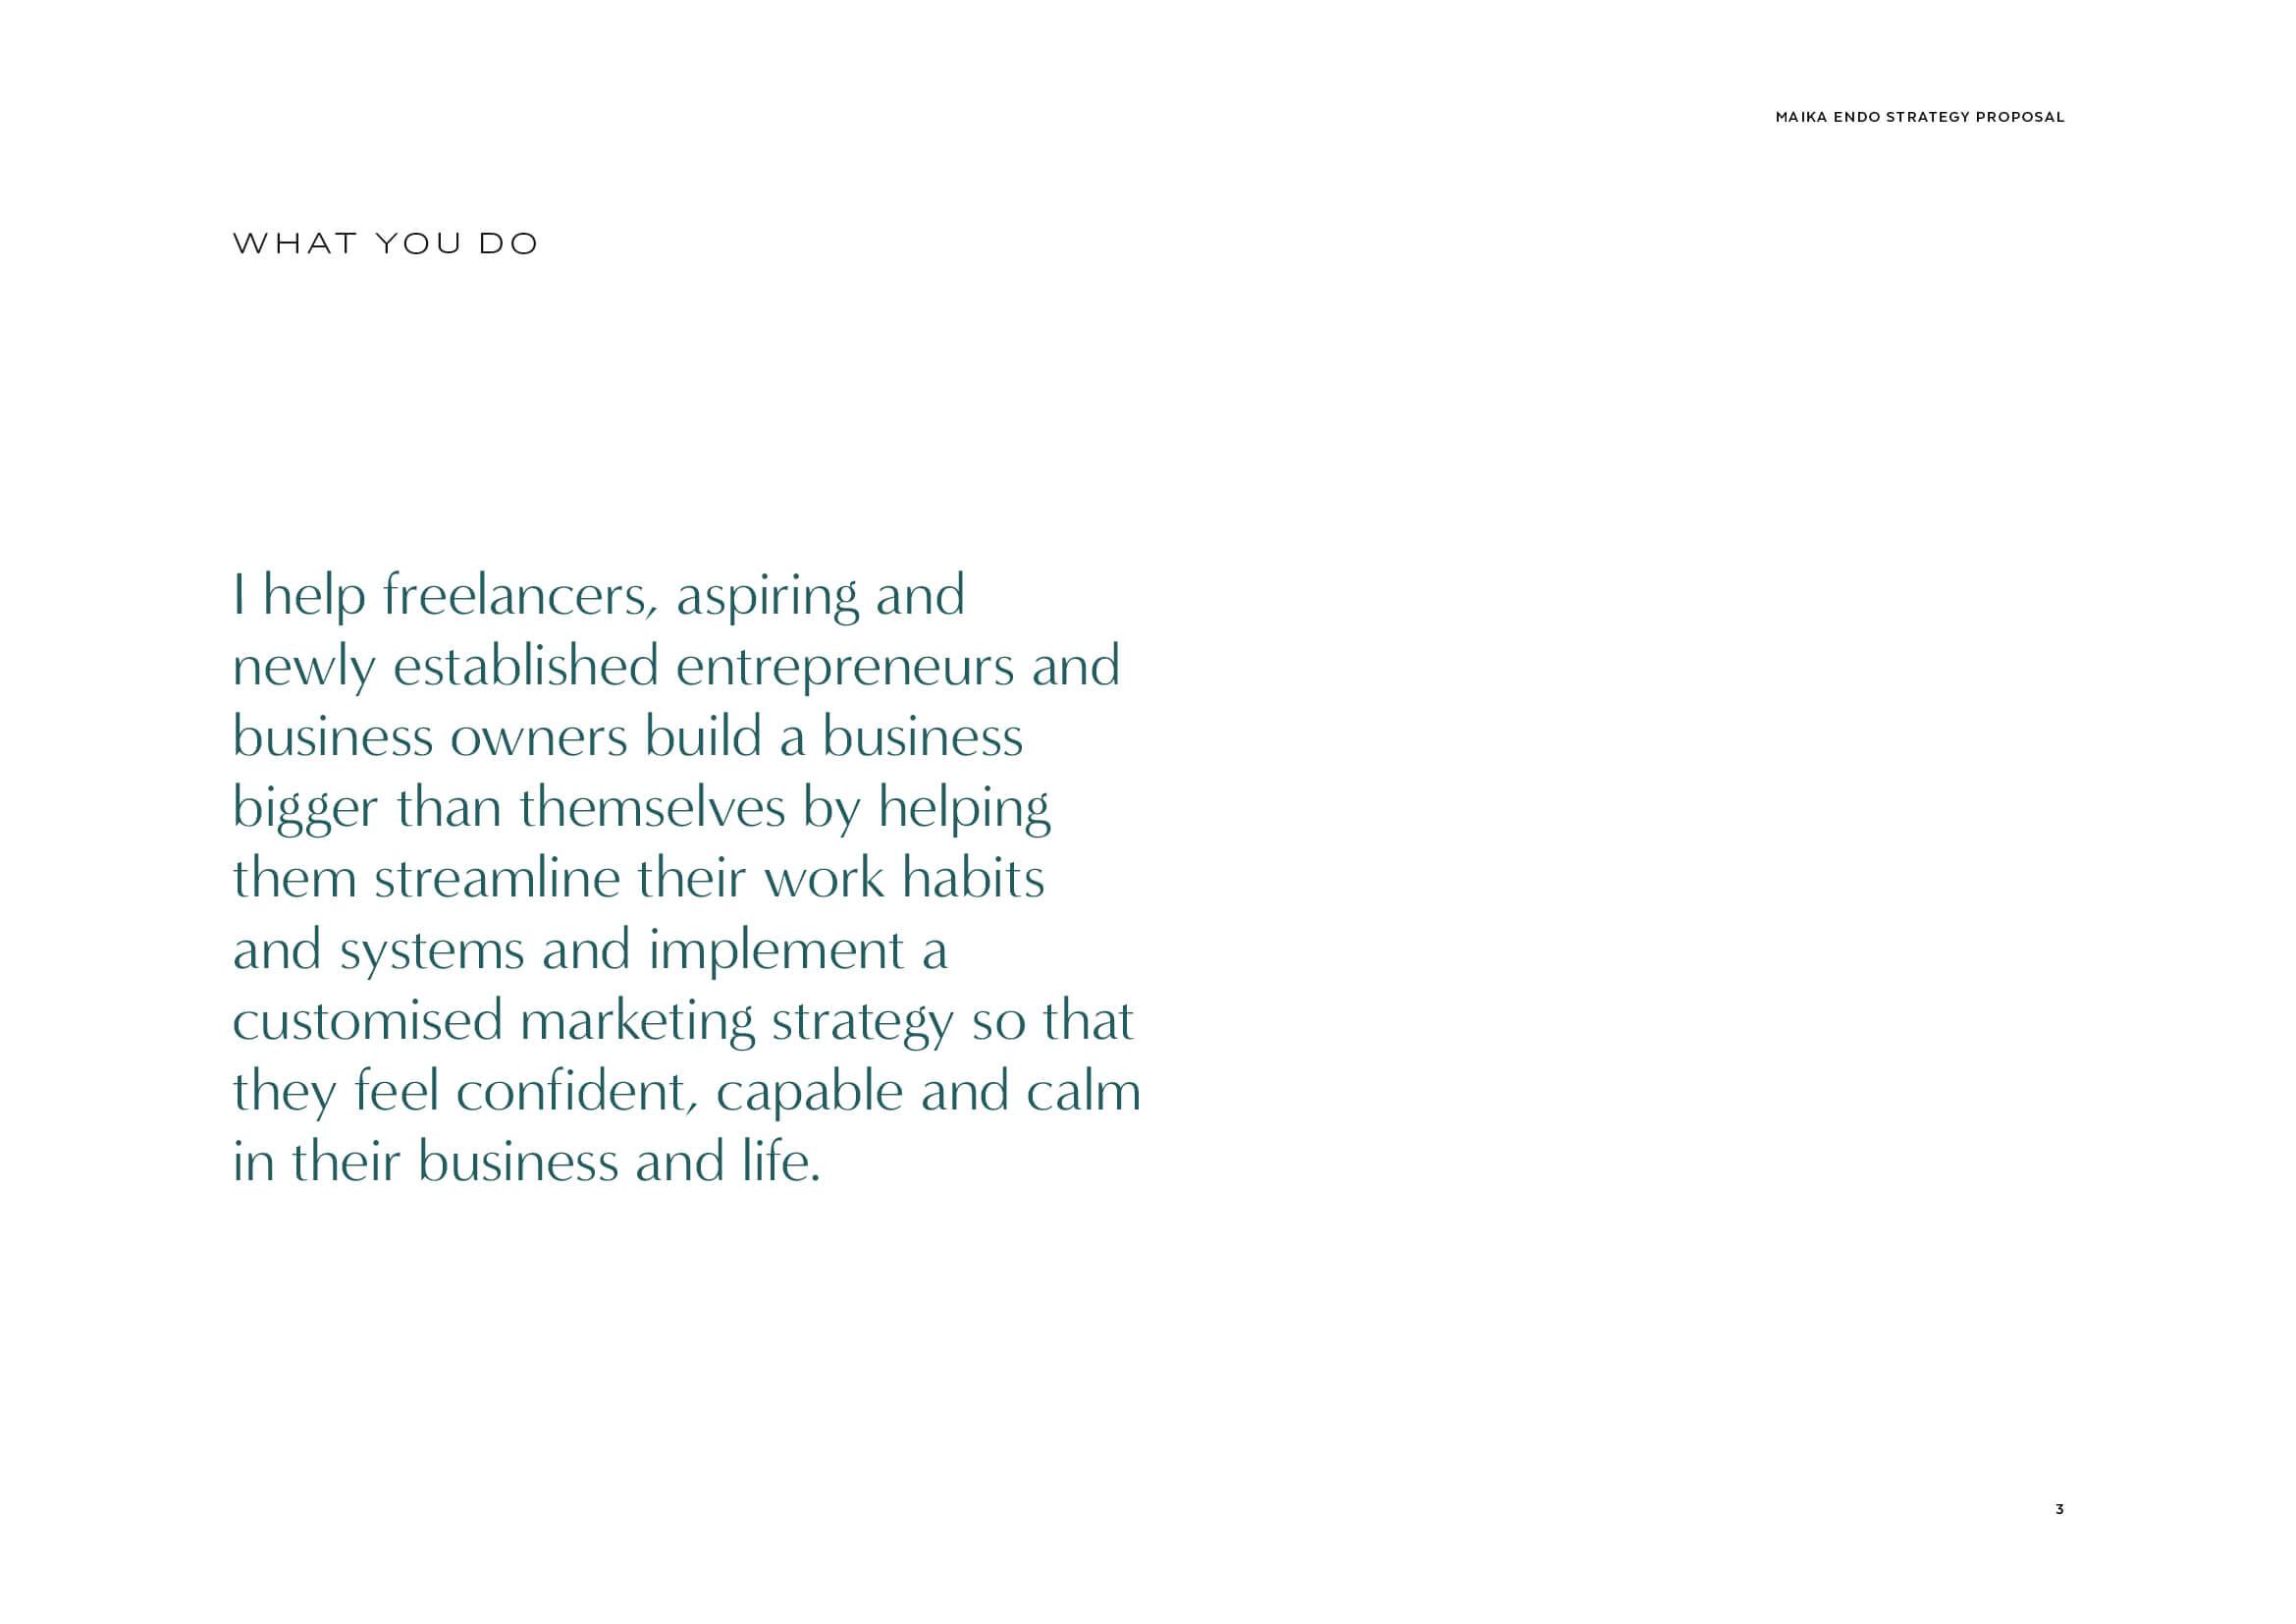 Maika Endo Strategy Proposal3.jpg